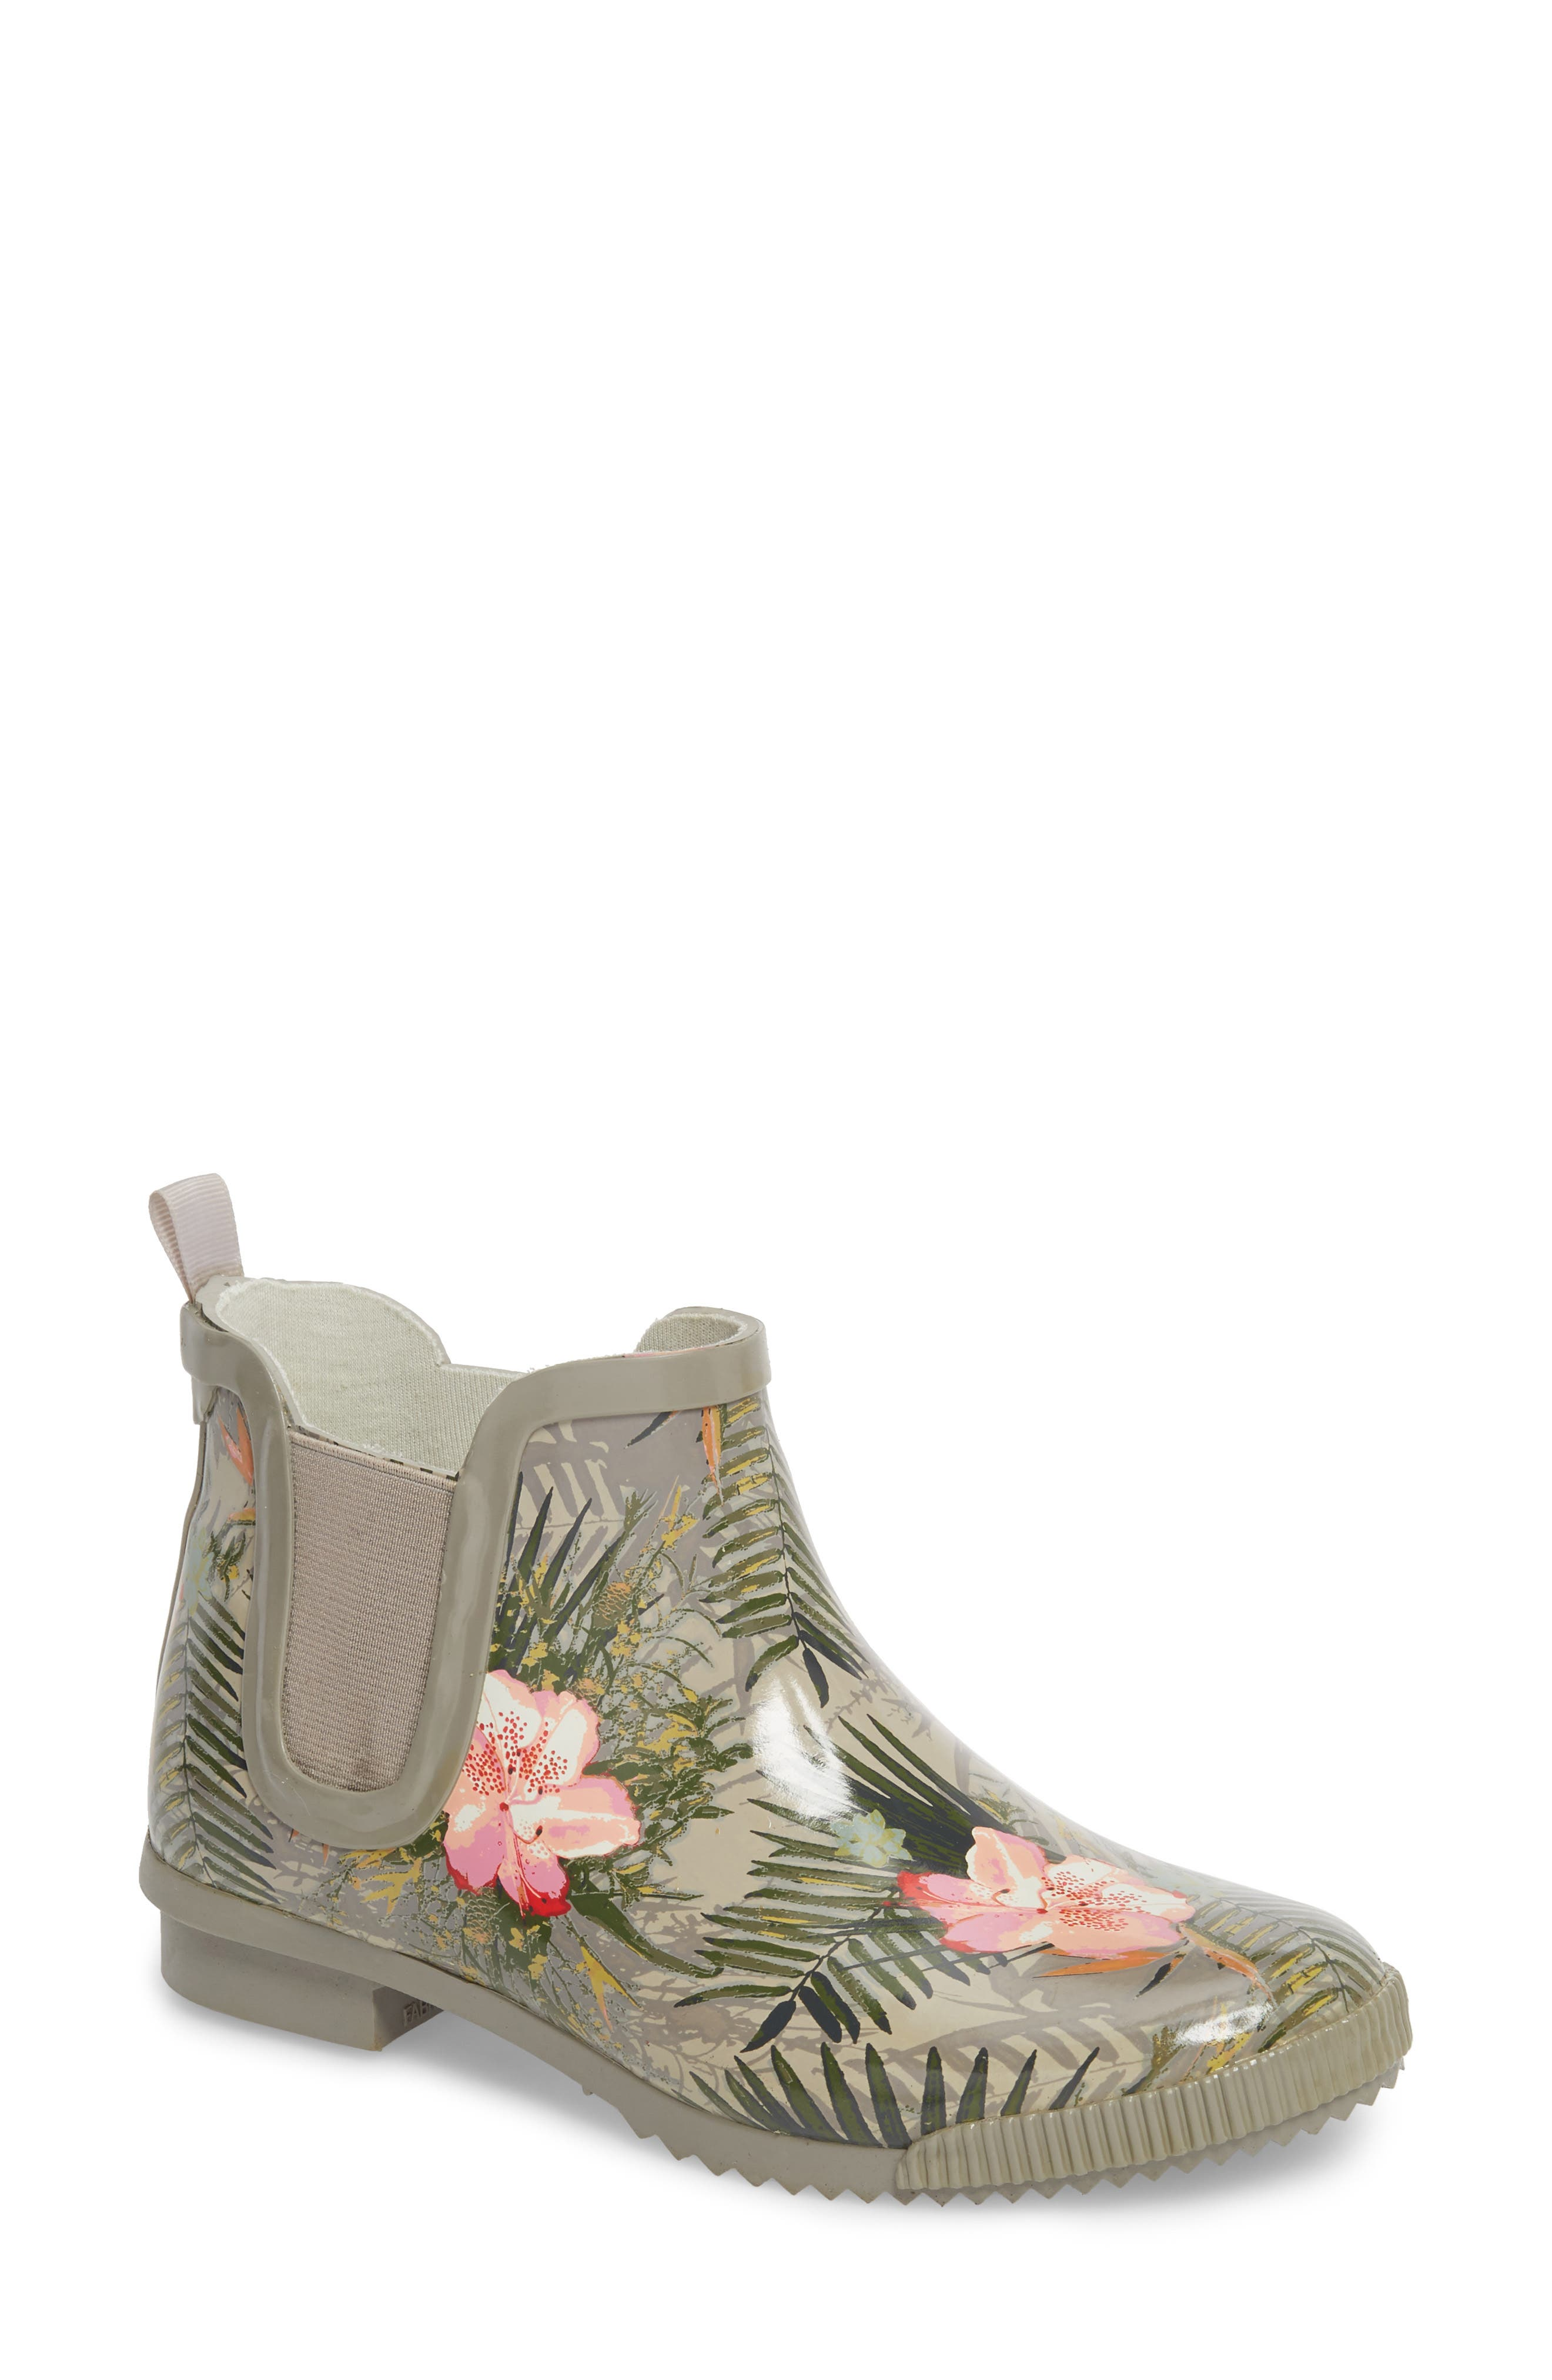 Regent Chelsea Rain Boot,                         Main,                         color, LUSH TROPICS